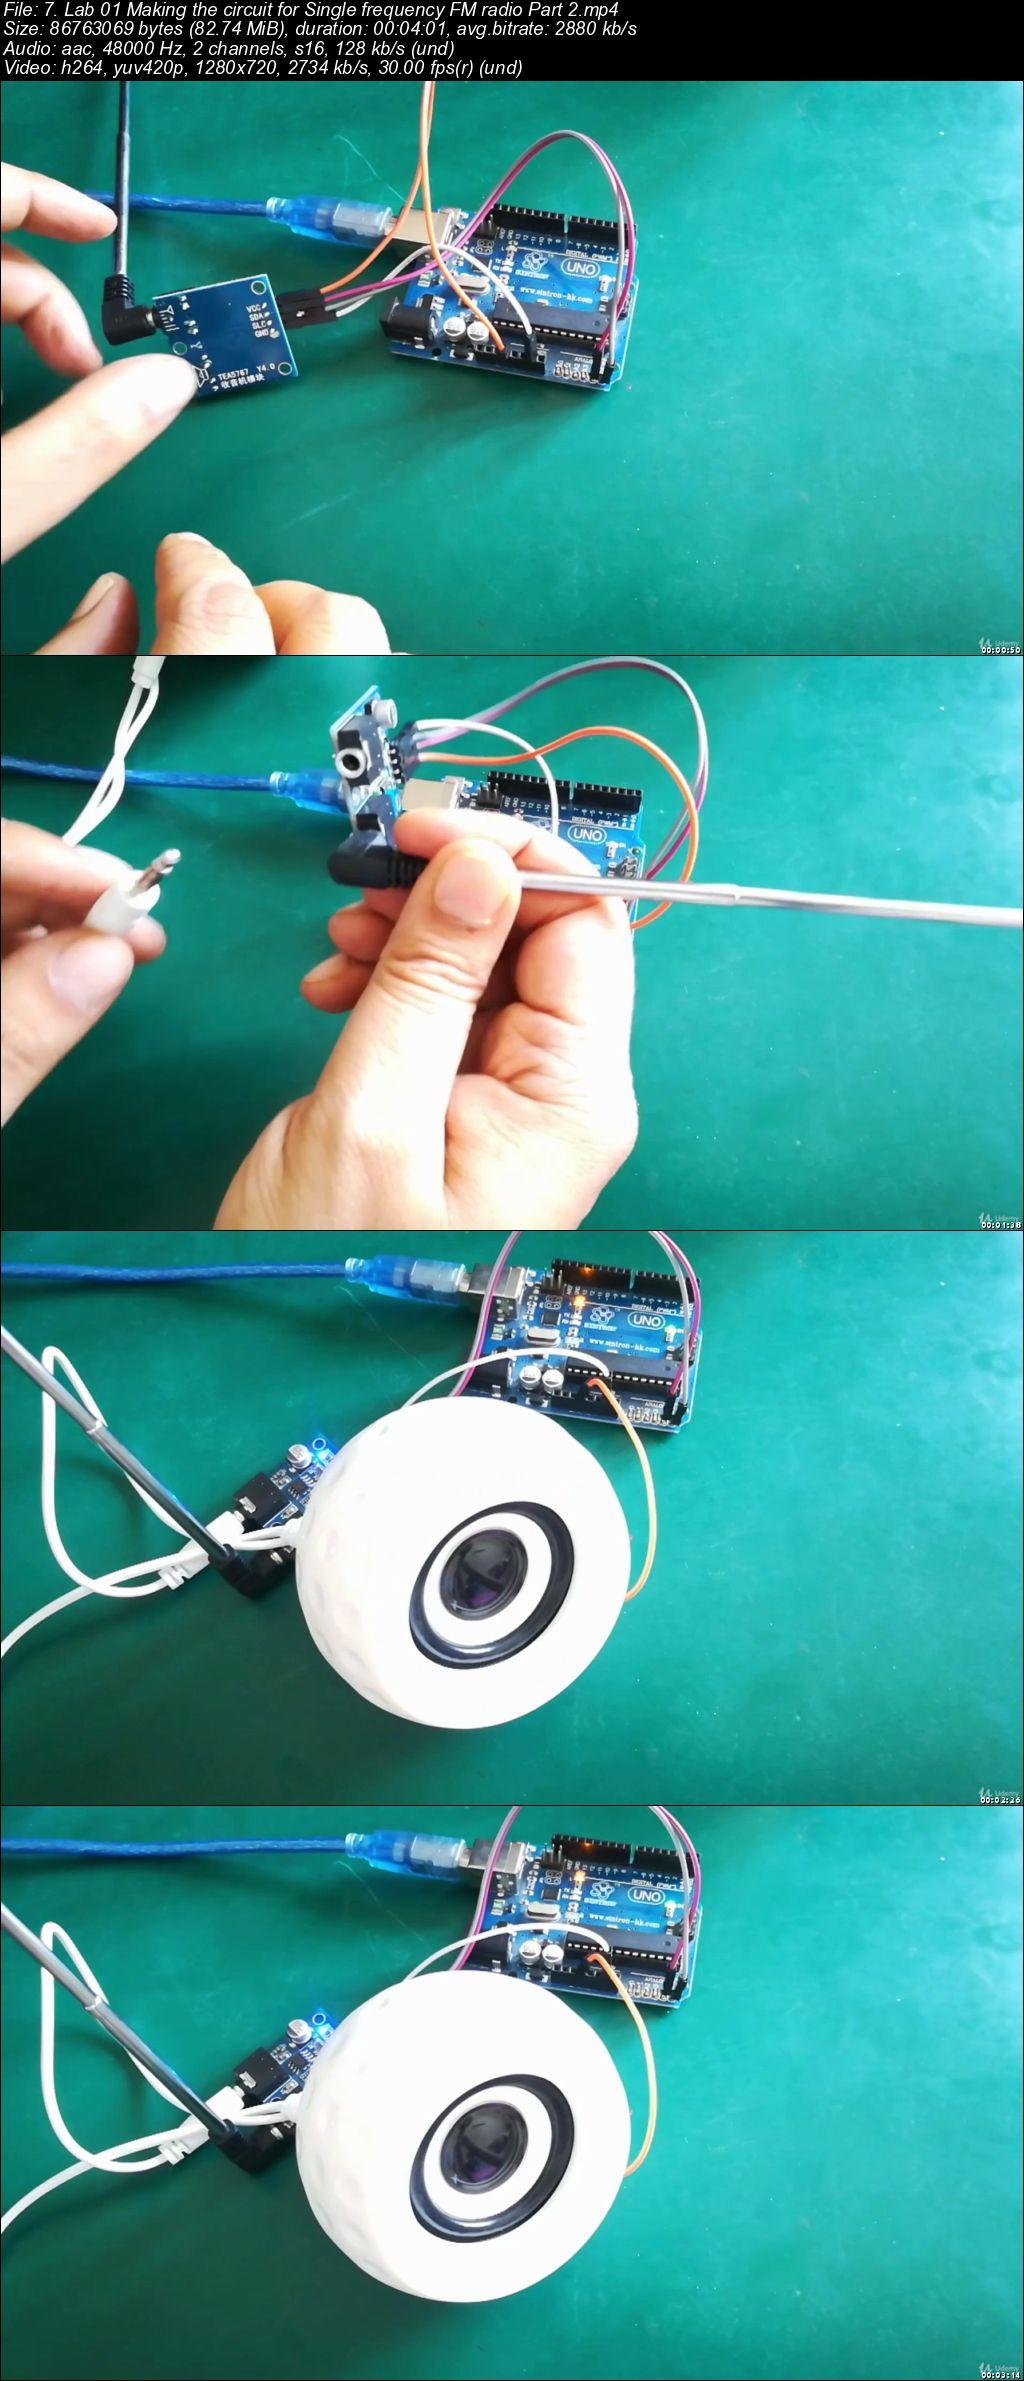 Learn Arduino I2C by making an Arduino UNO FM radio receiver